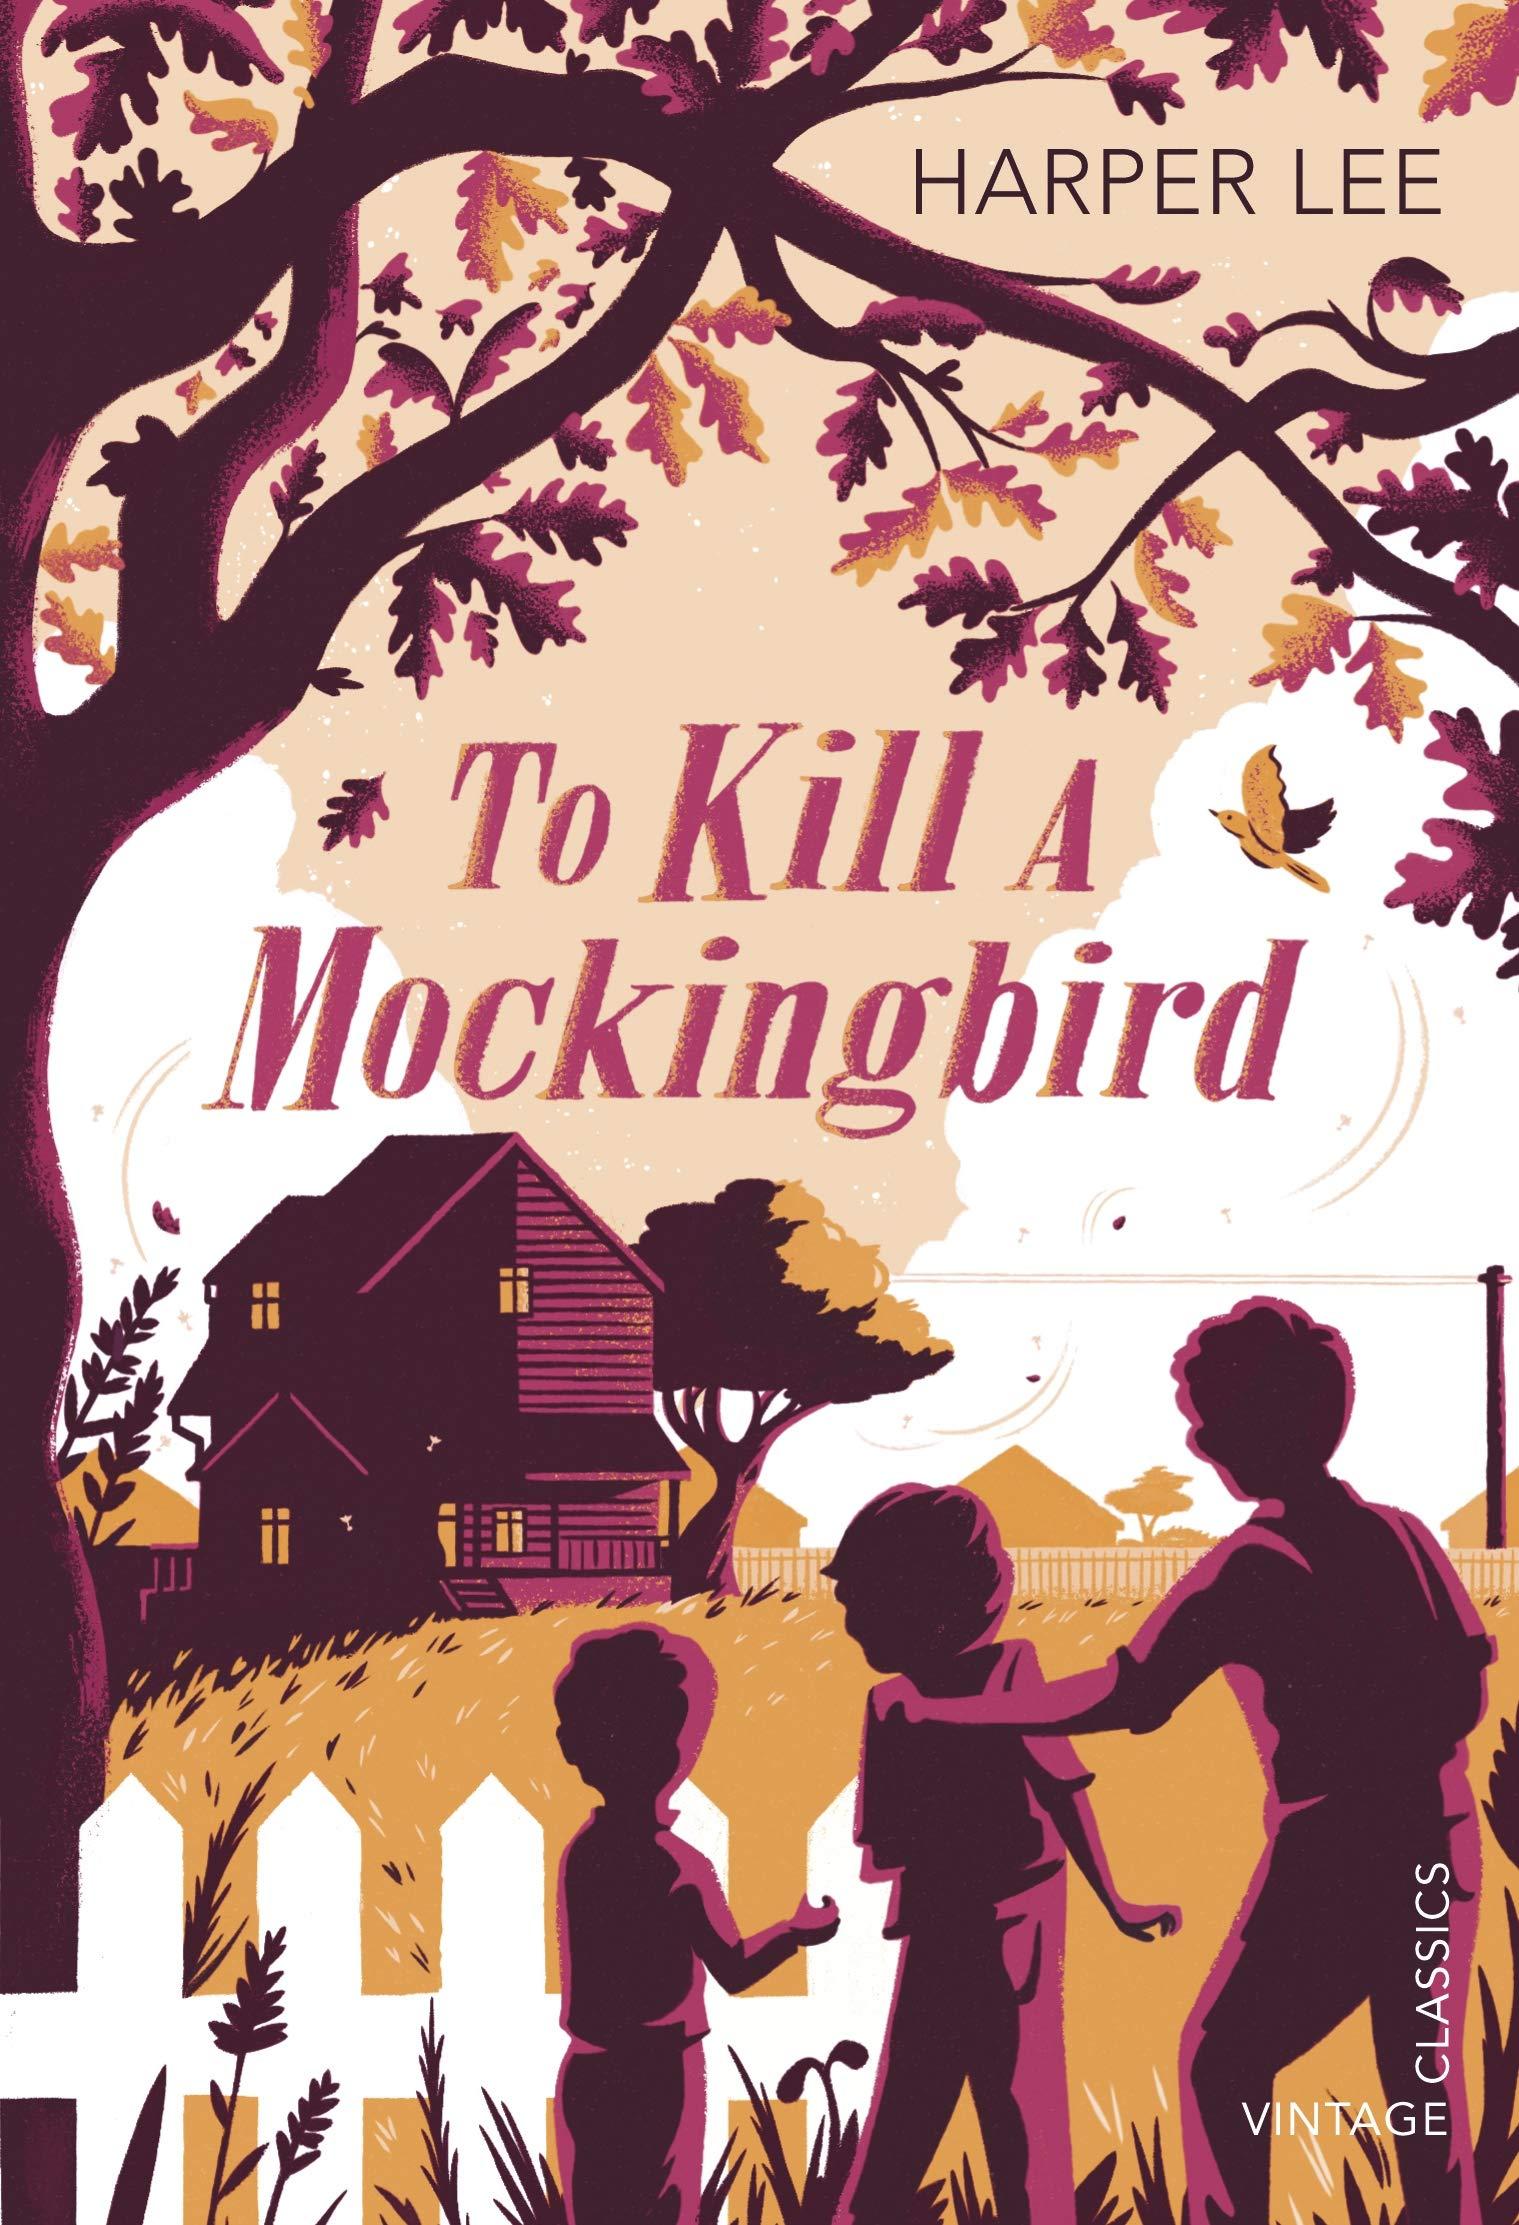 To Kill A Mockingbird Full Book